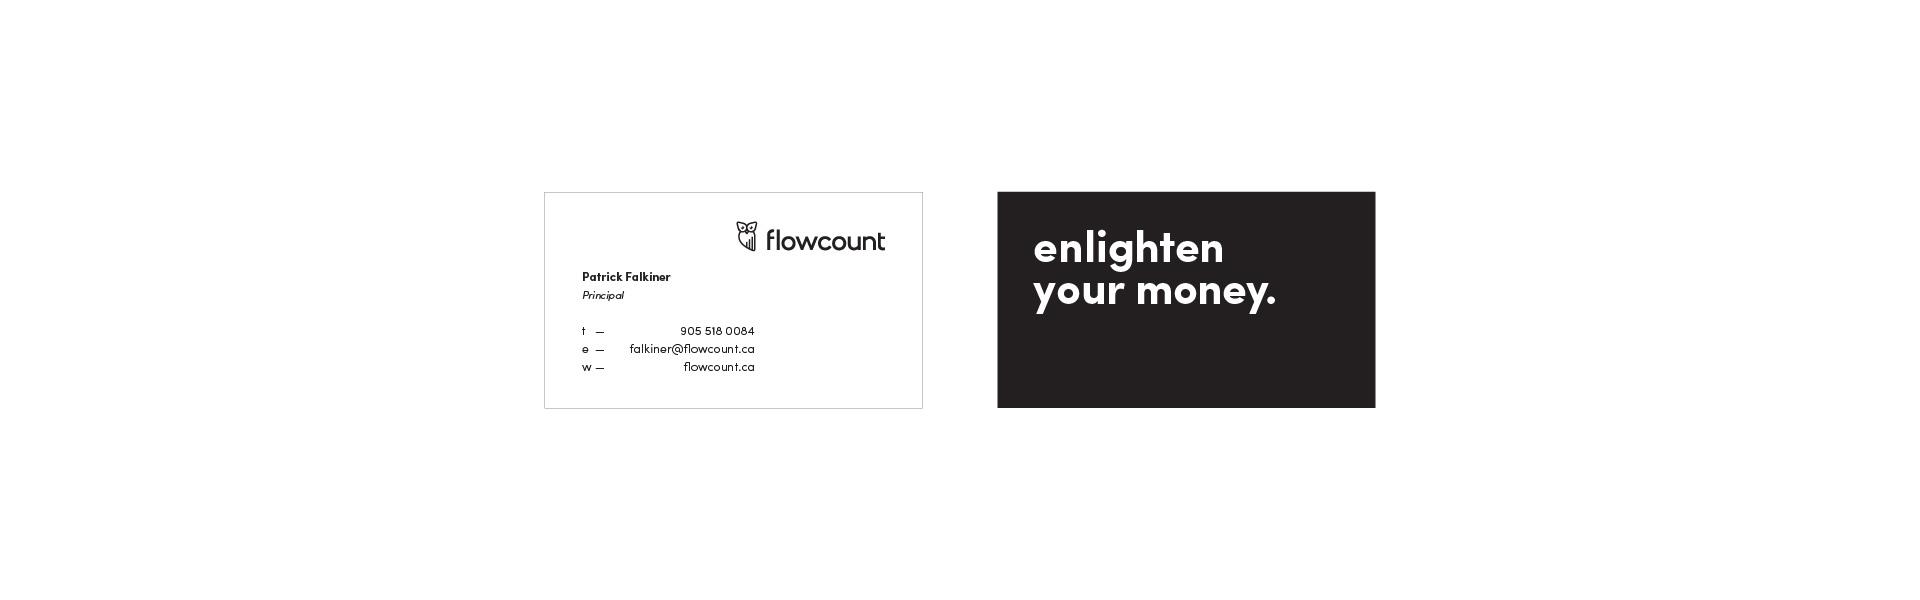 Flowcount Business Card Design